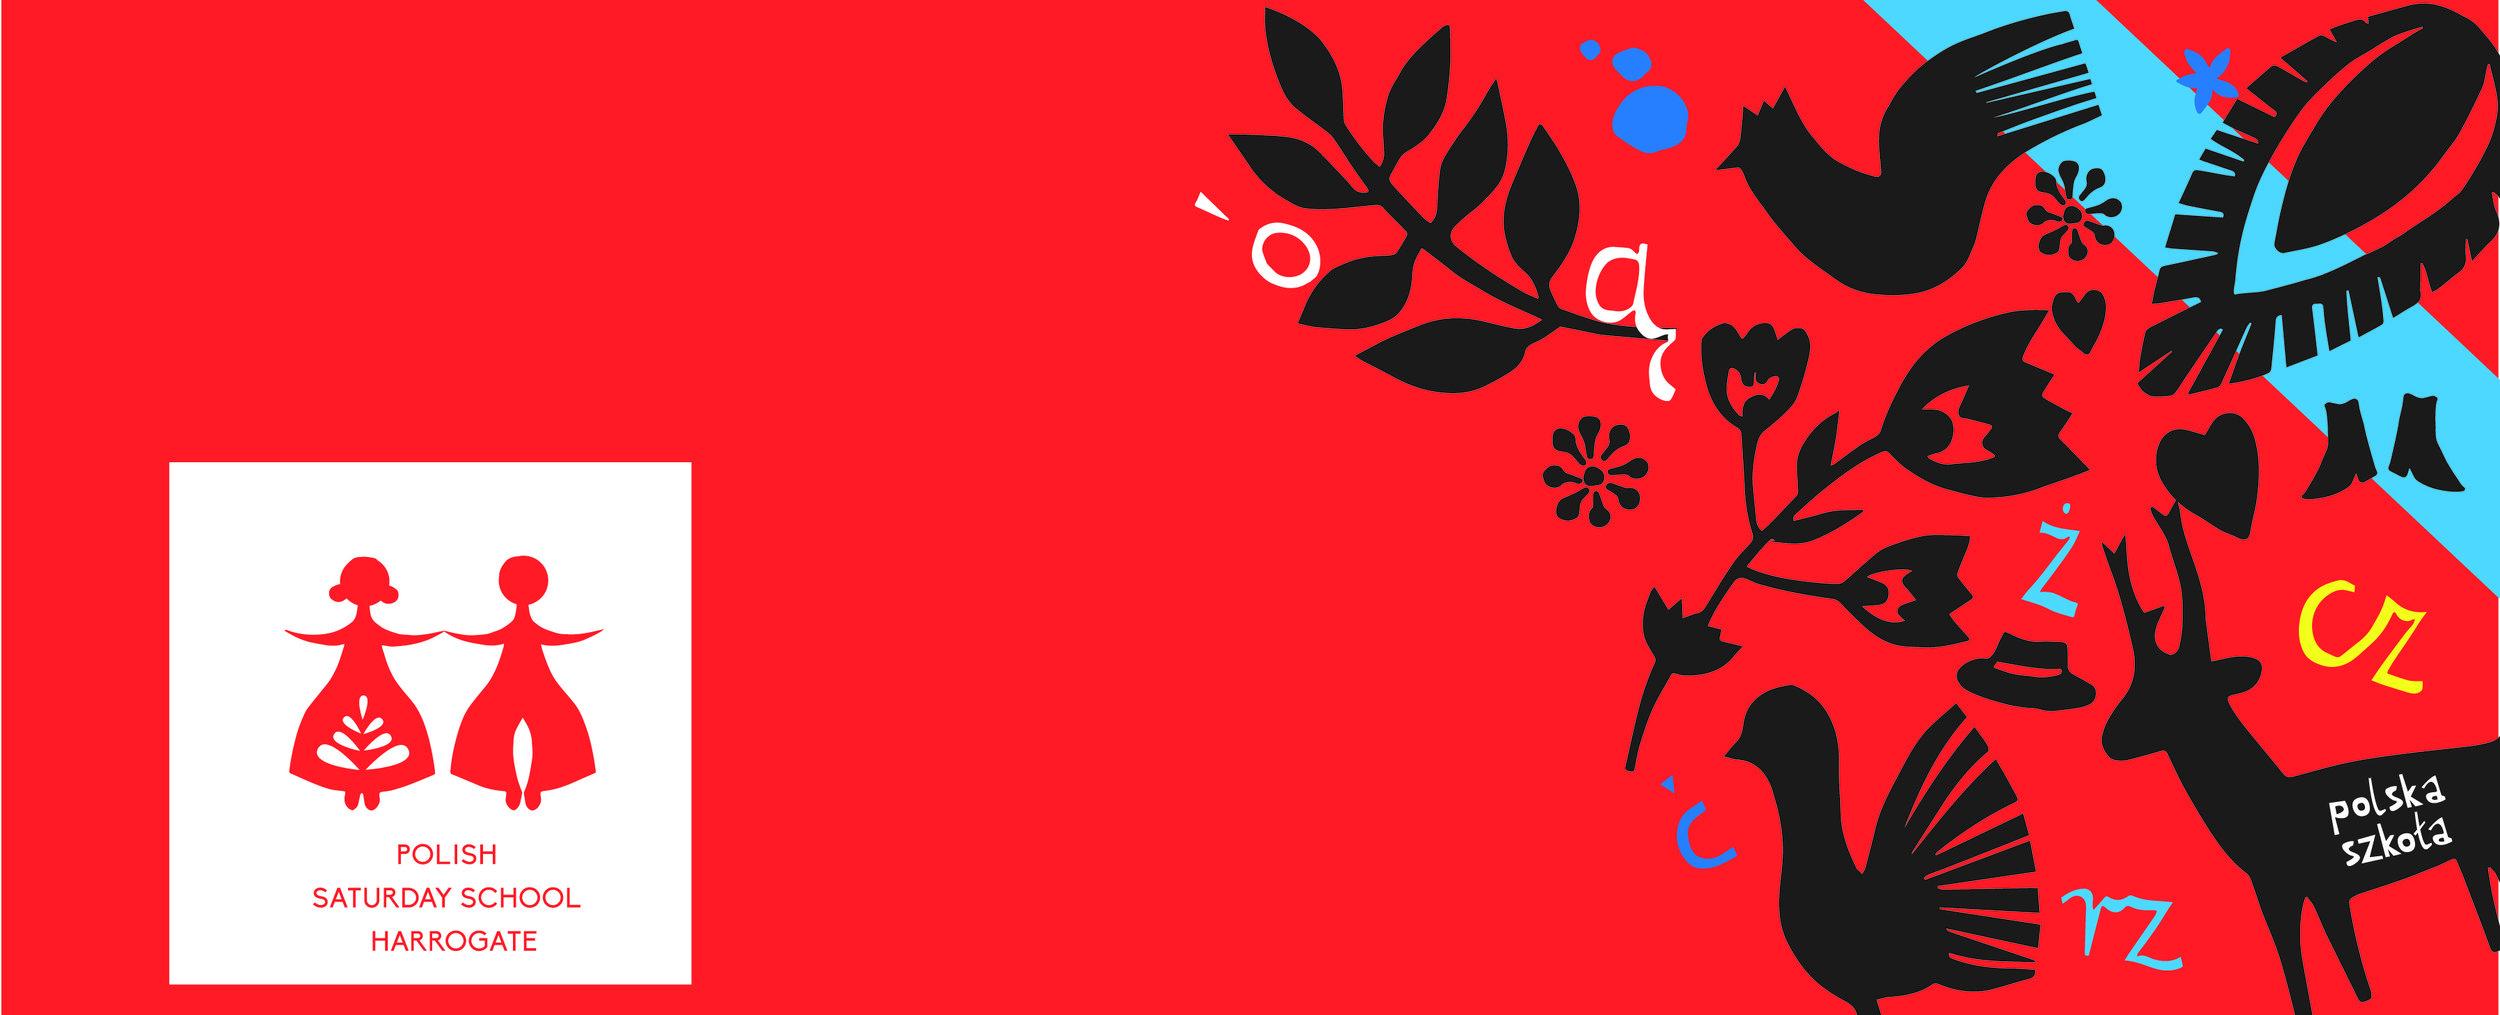 banner czerwony-01.jpg